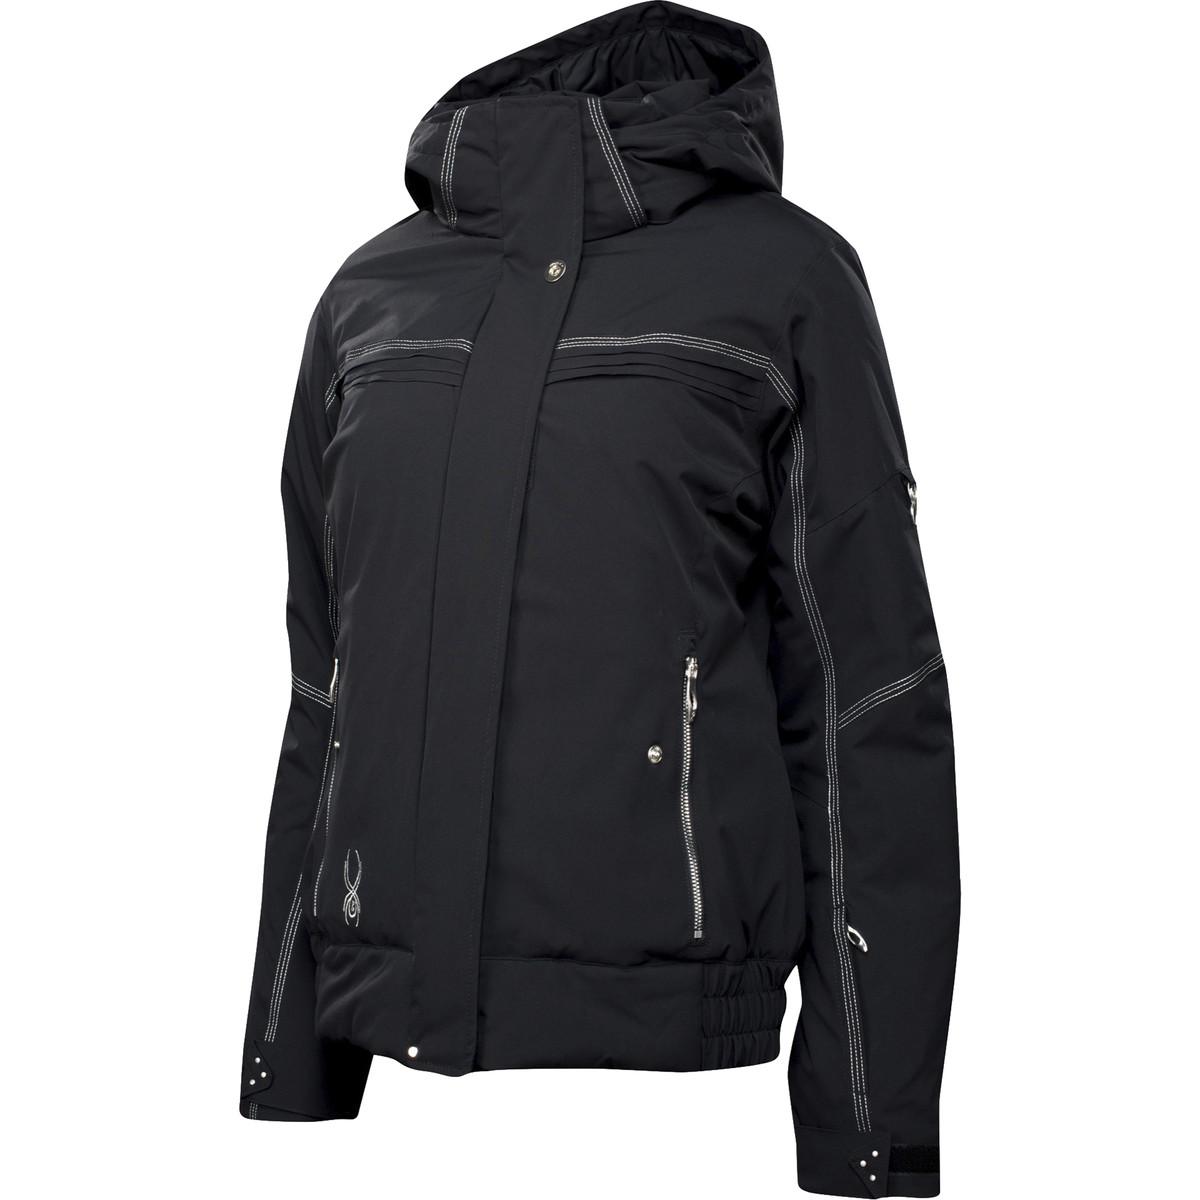 Spyder Juno Jacket